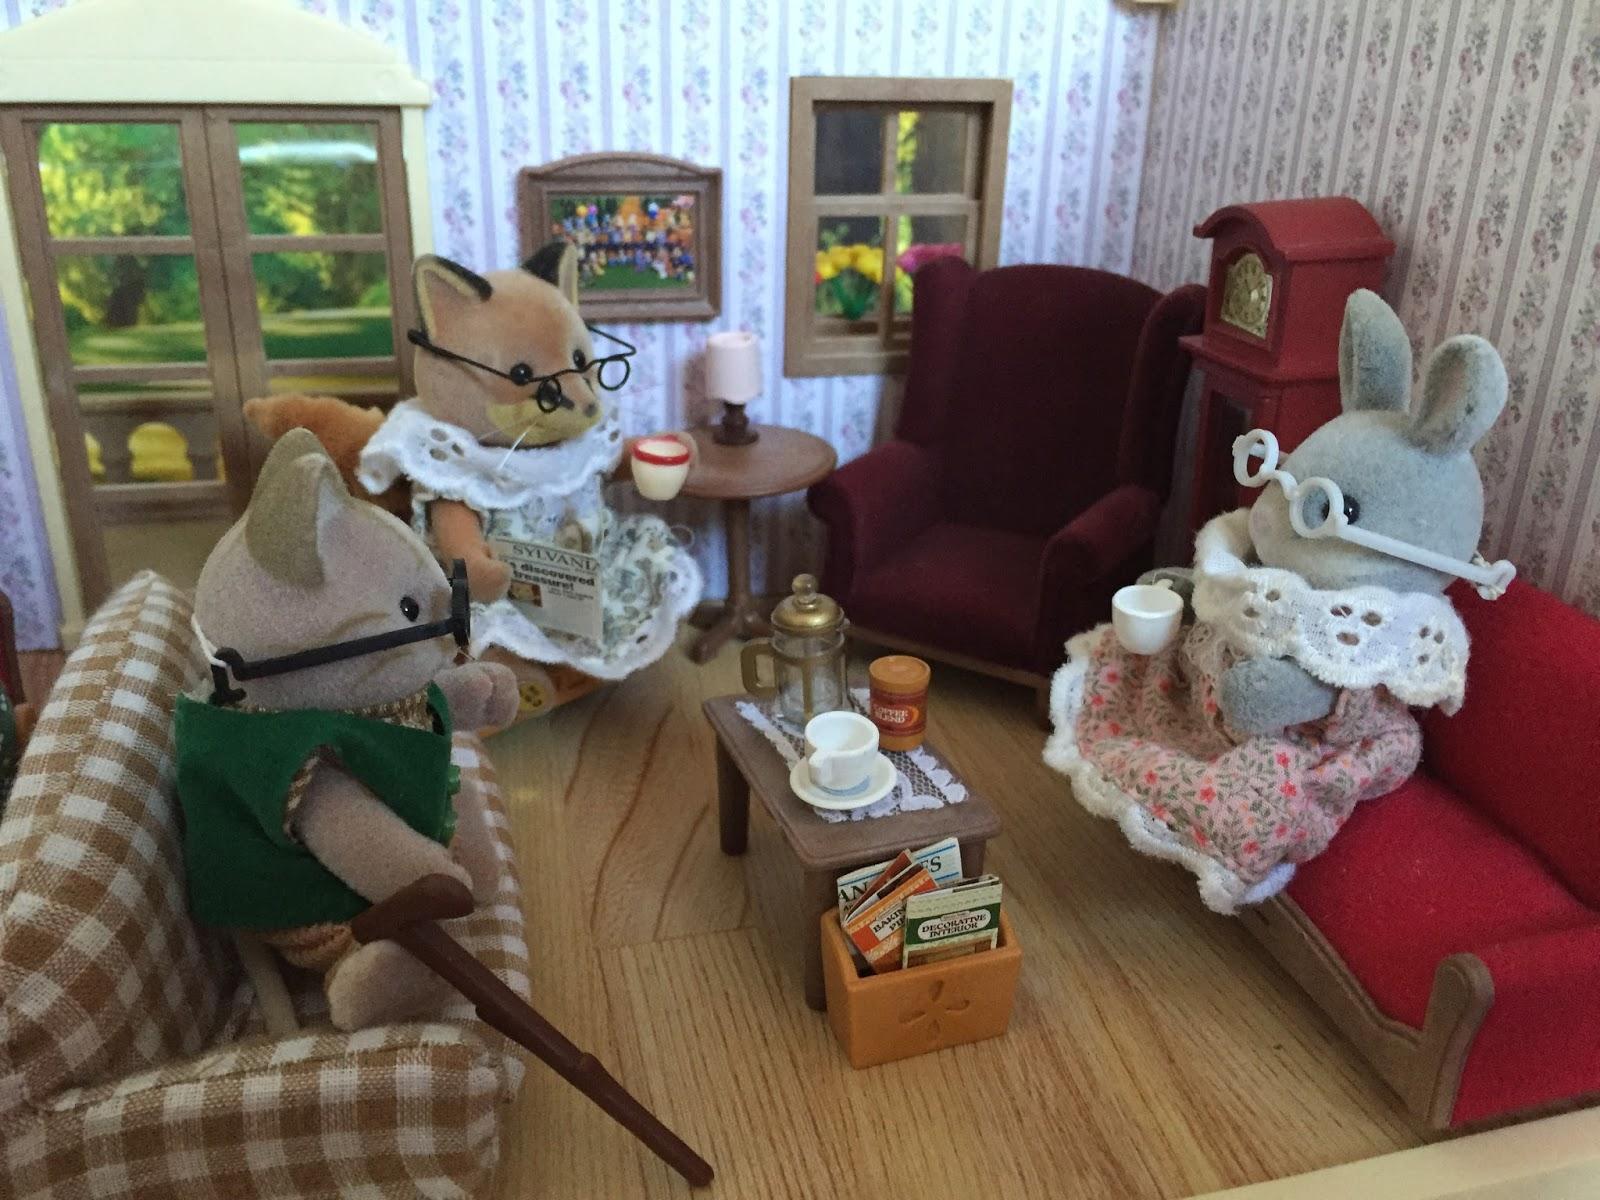 Sylvanian Families Country Living Room Set Toysrus Babiesrus   Swivel  Classy Sylvanian Families Living Room Set